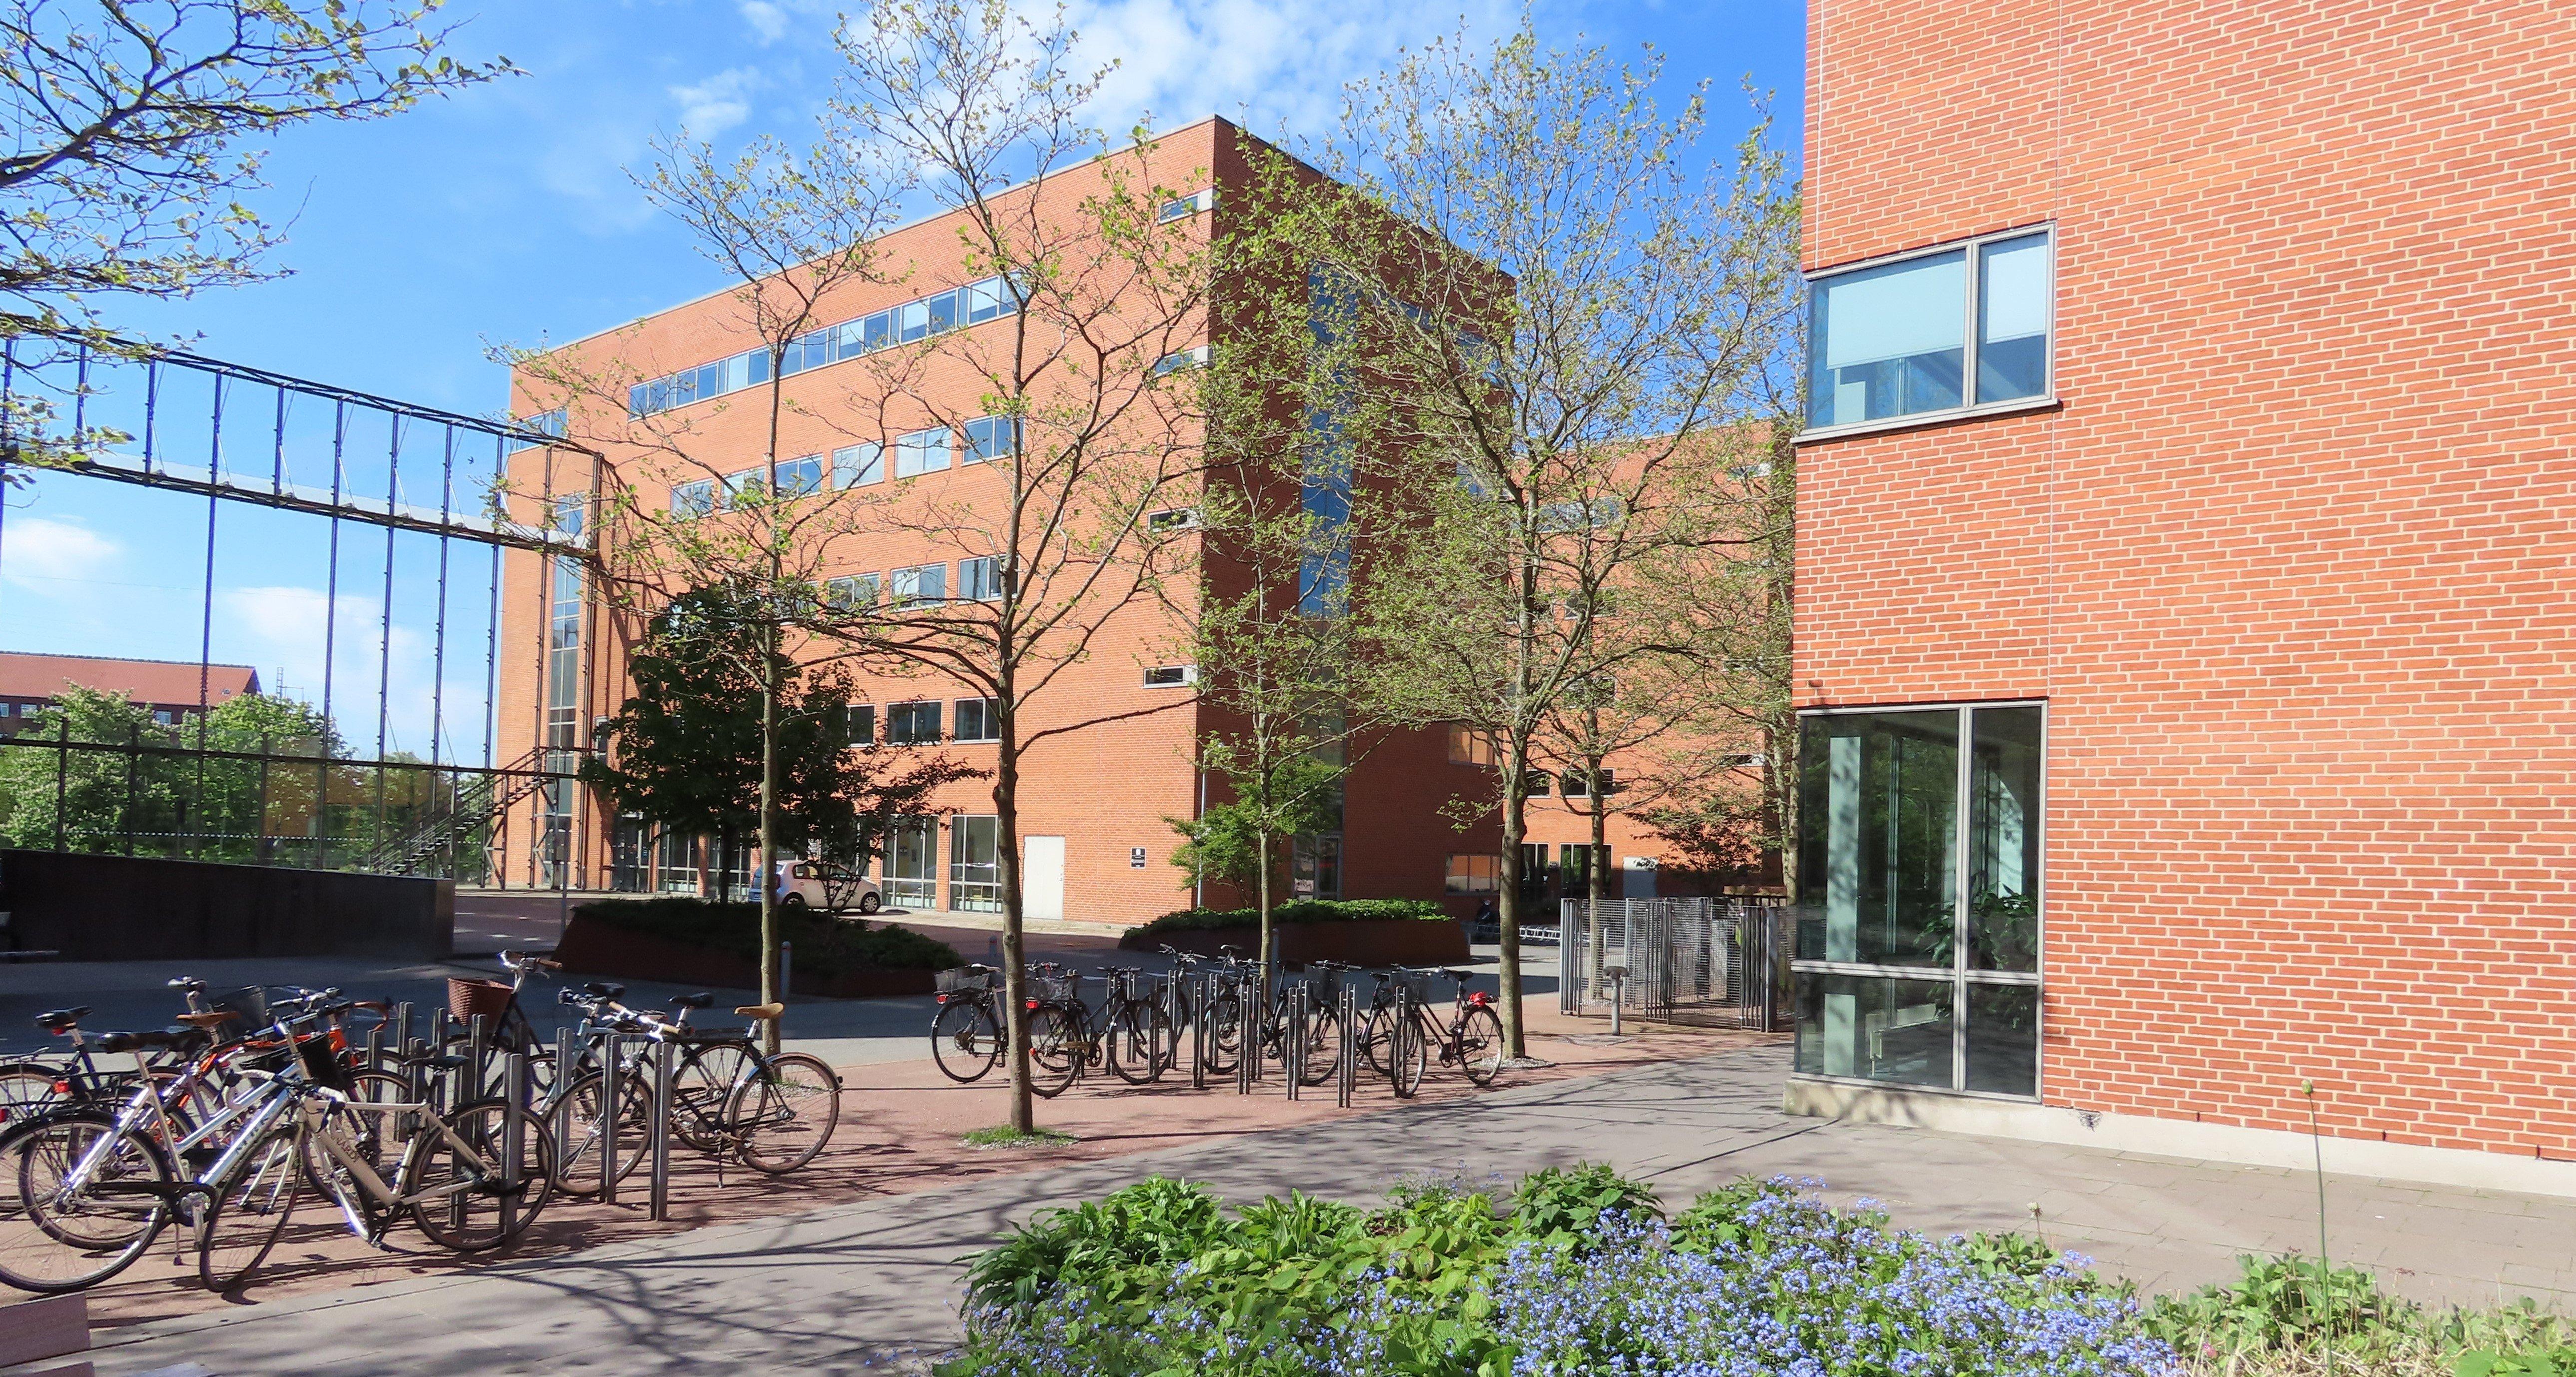 Aarhus University bikes